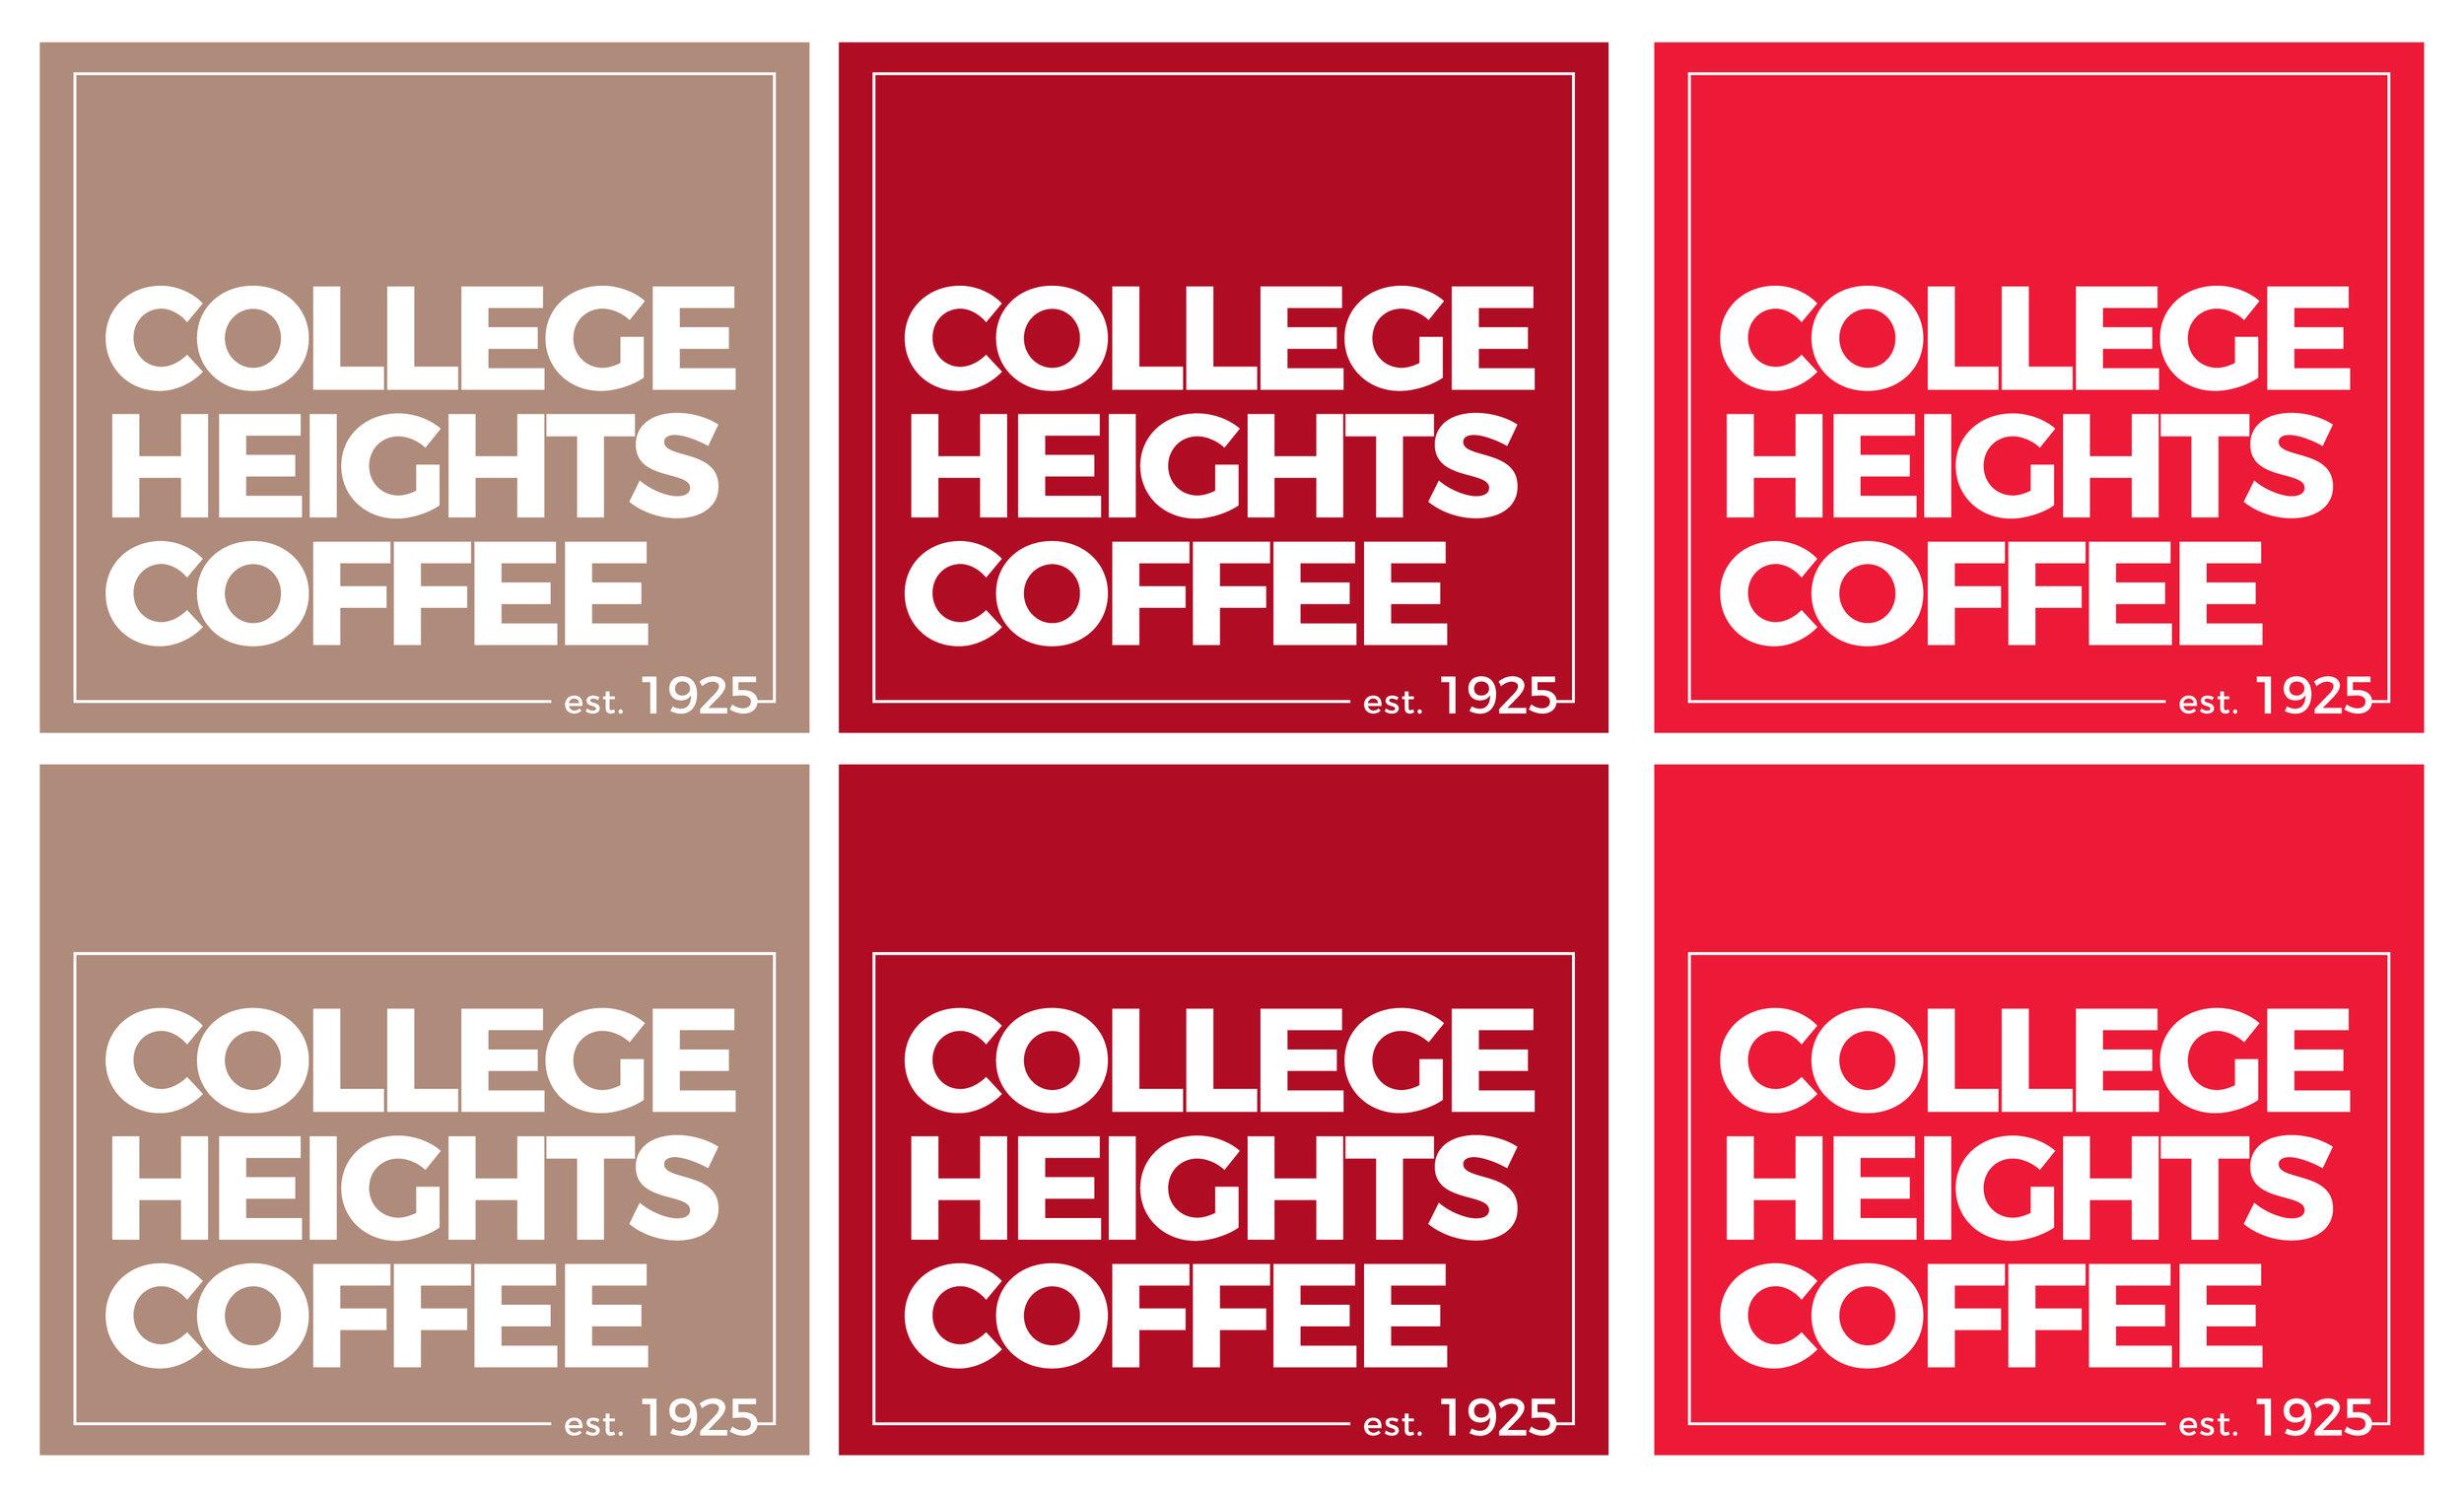 college_heights_coffee-02.jpg